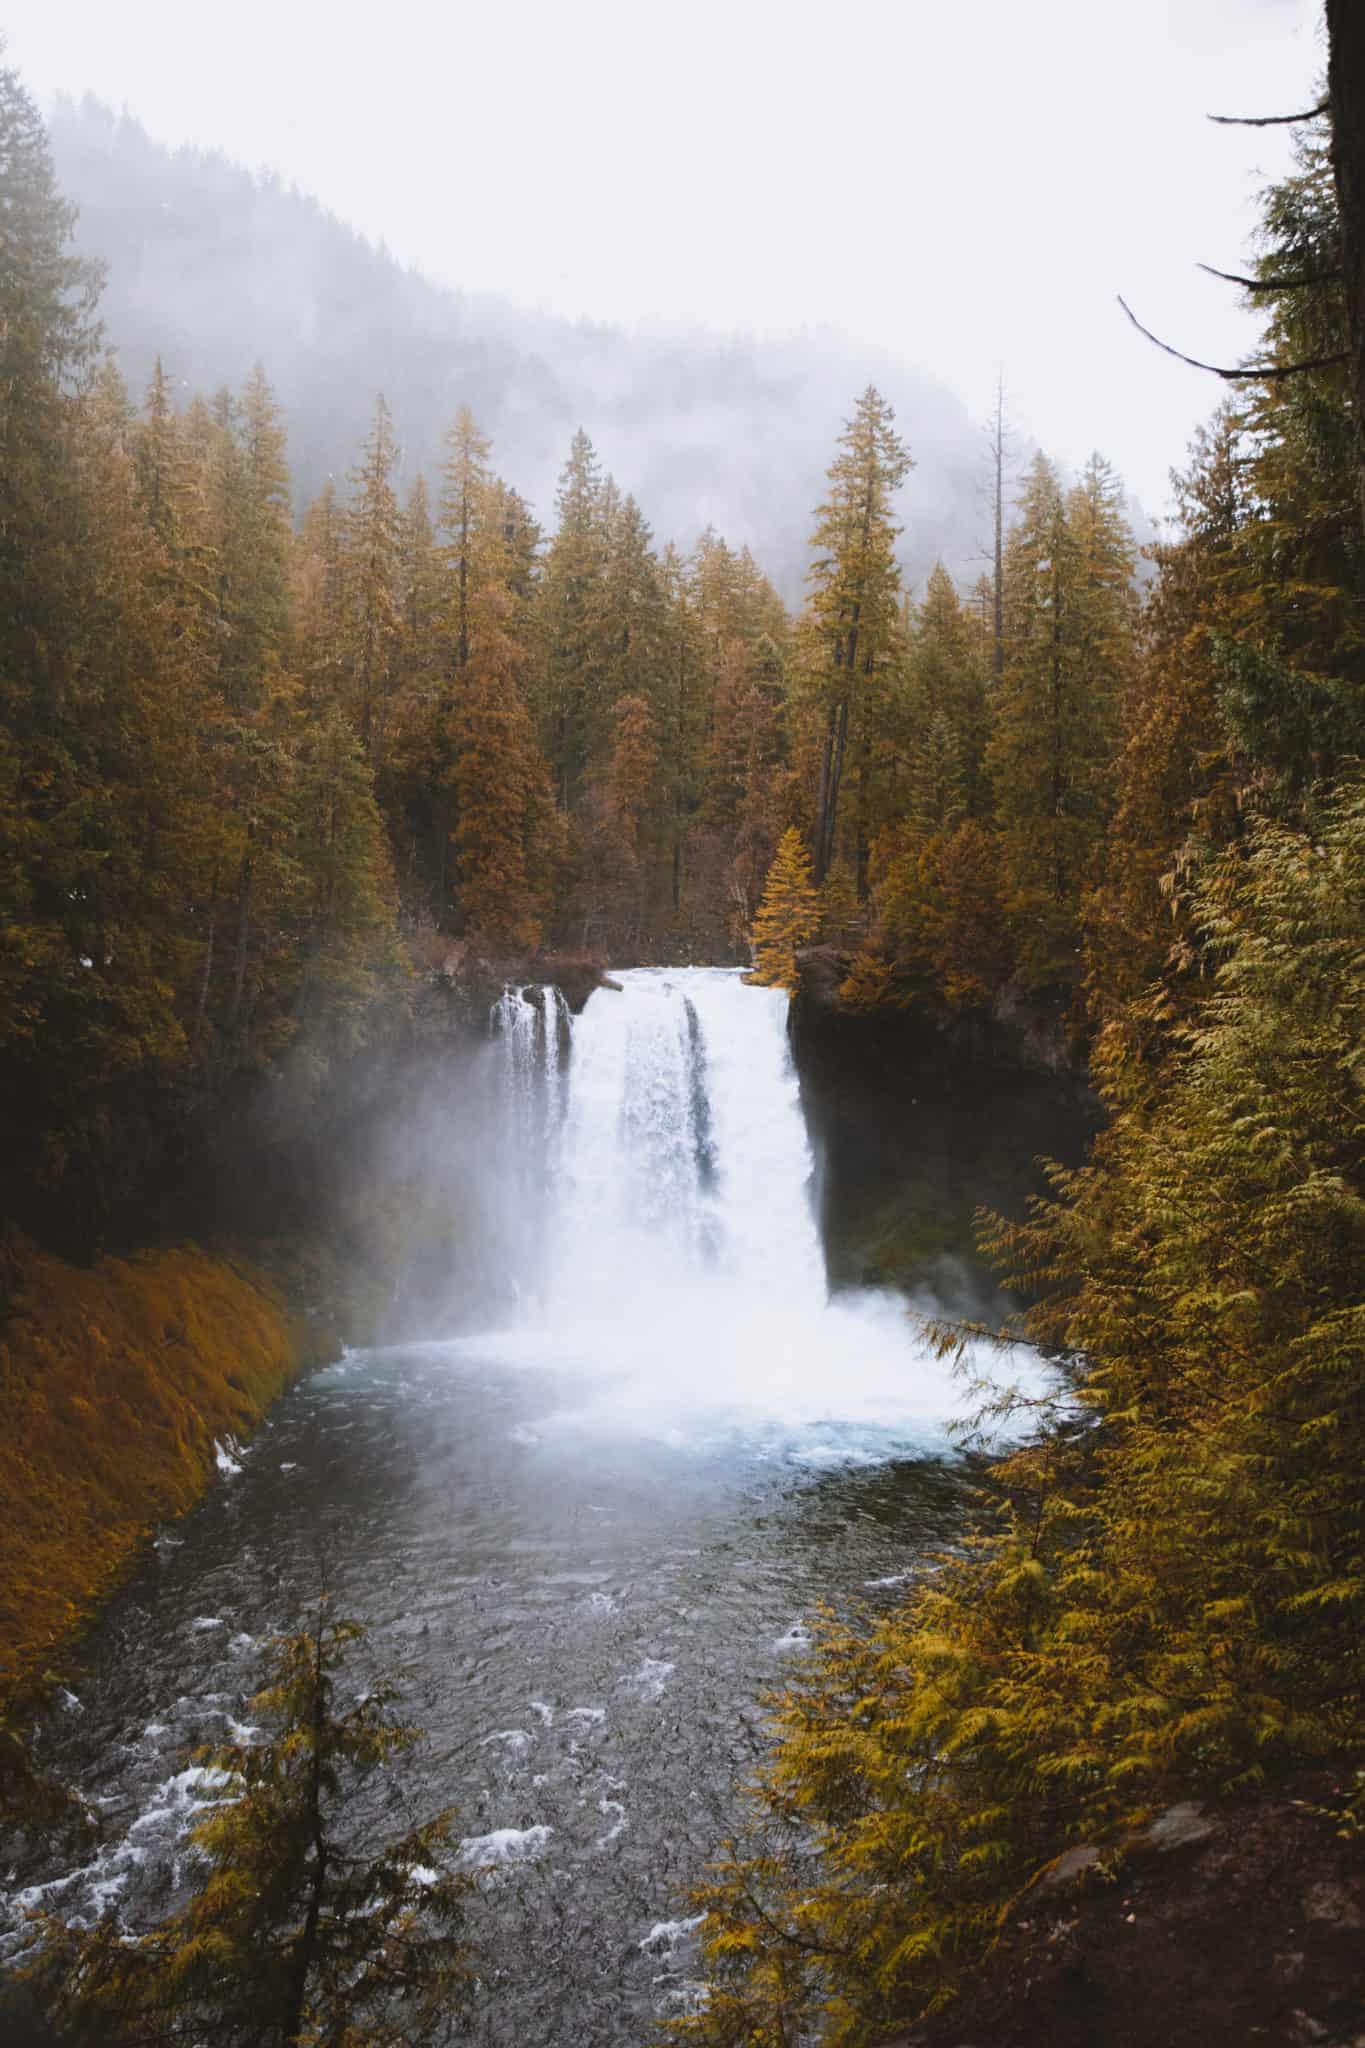 Koosah Falls, Oregon on January